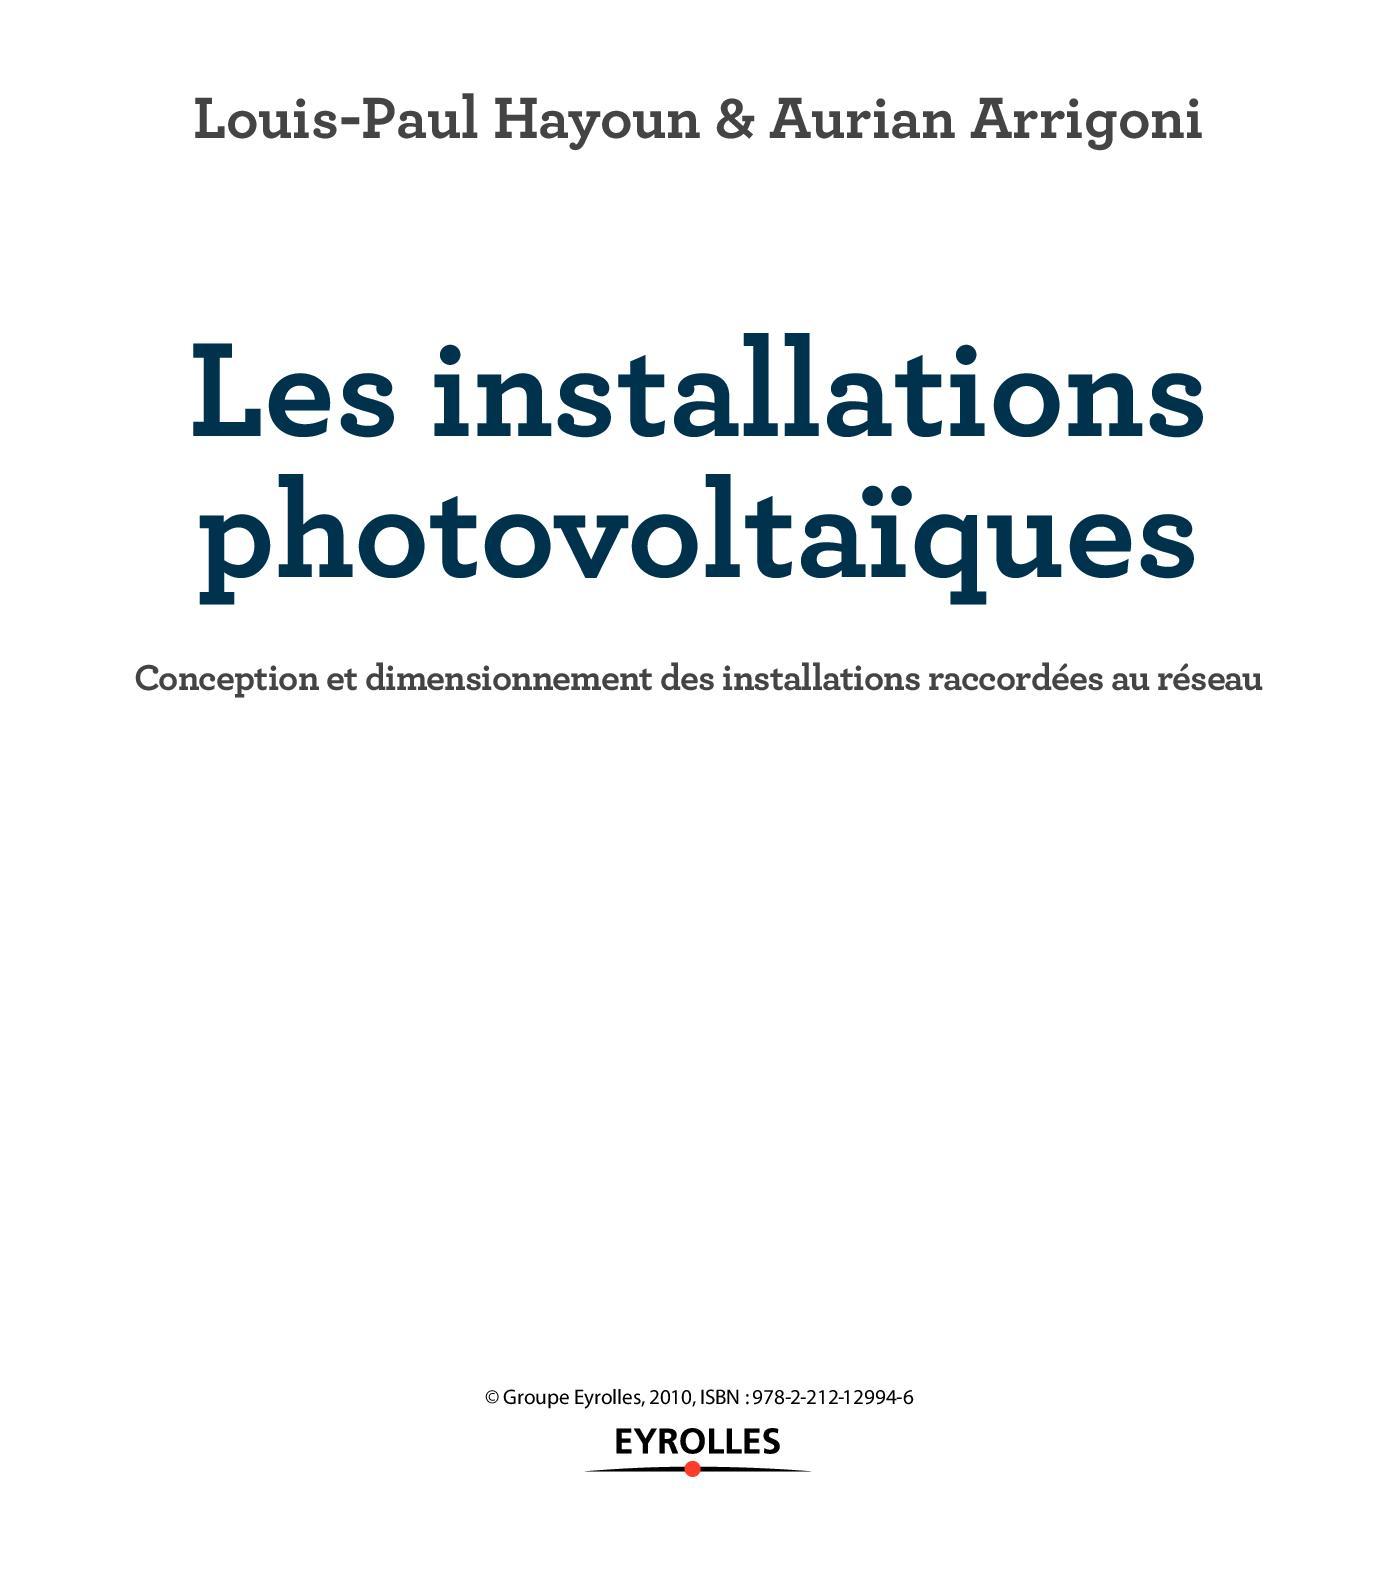 Les installations photovoltaïques - Chap-1_Hayoun.pdf